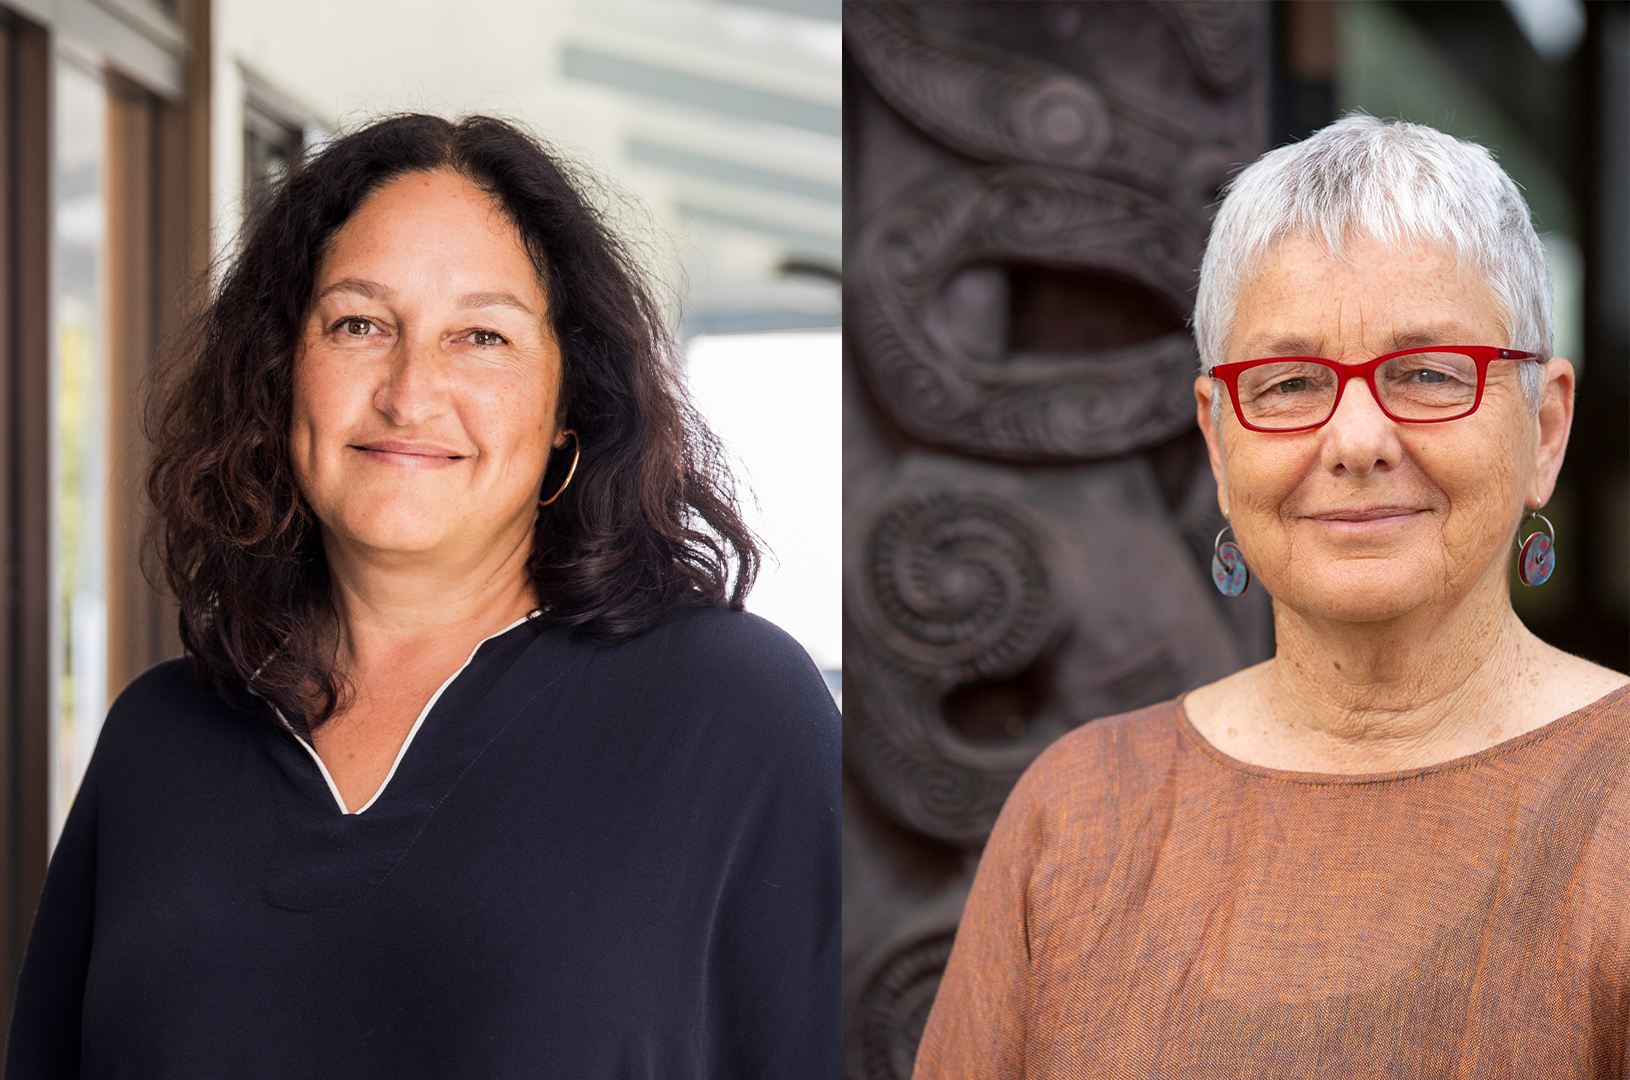 Ka whawhai tonu tāua: A feisty conversation about Māori-Pākehā relations